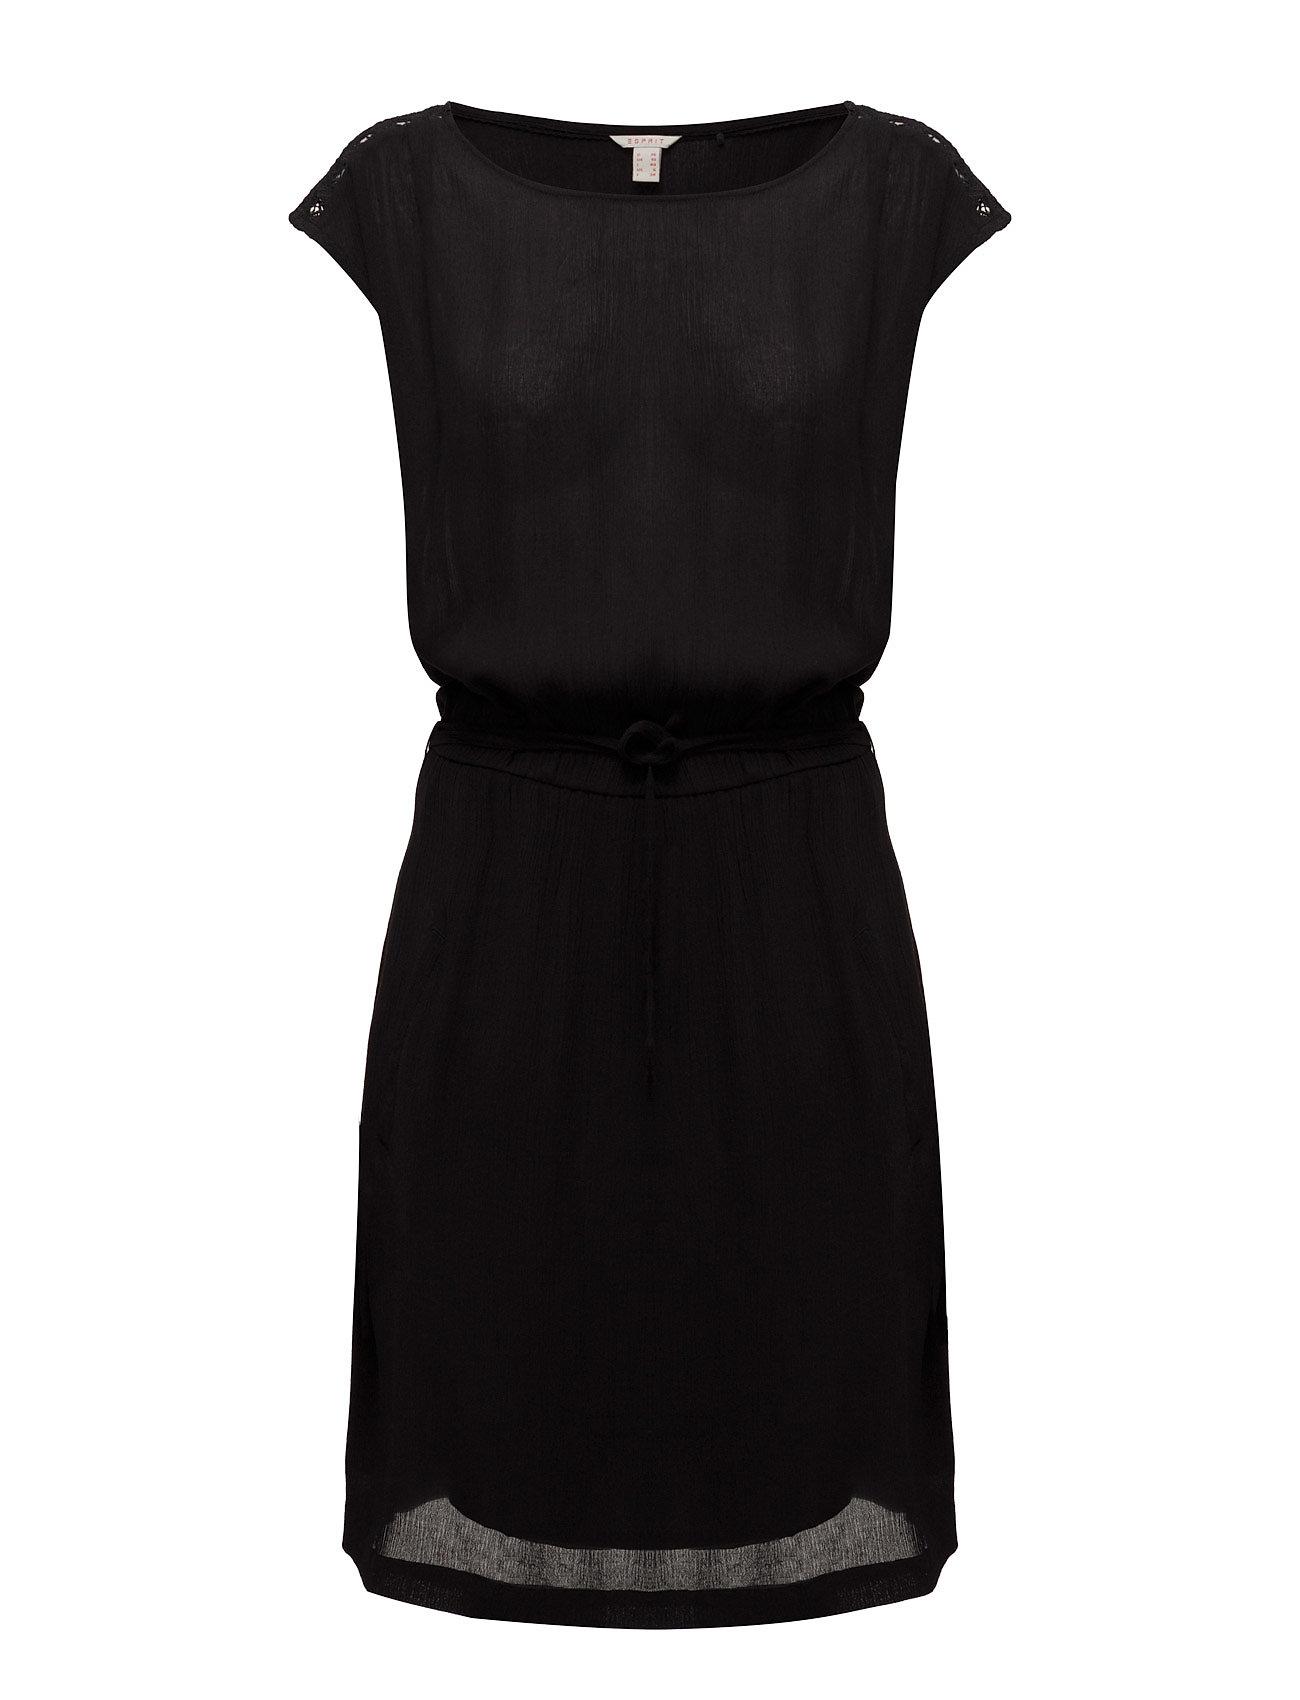 Dresses Light Woven Esprit Casual Kjoler til Kvinder i Sort